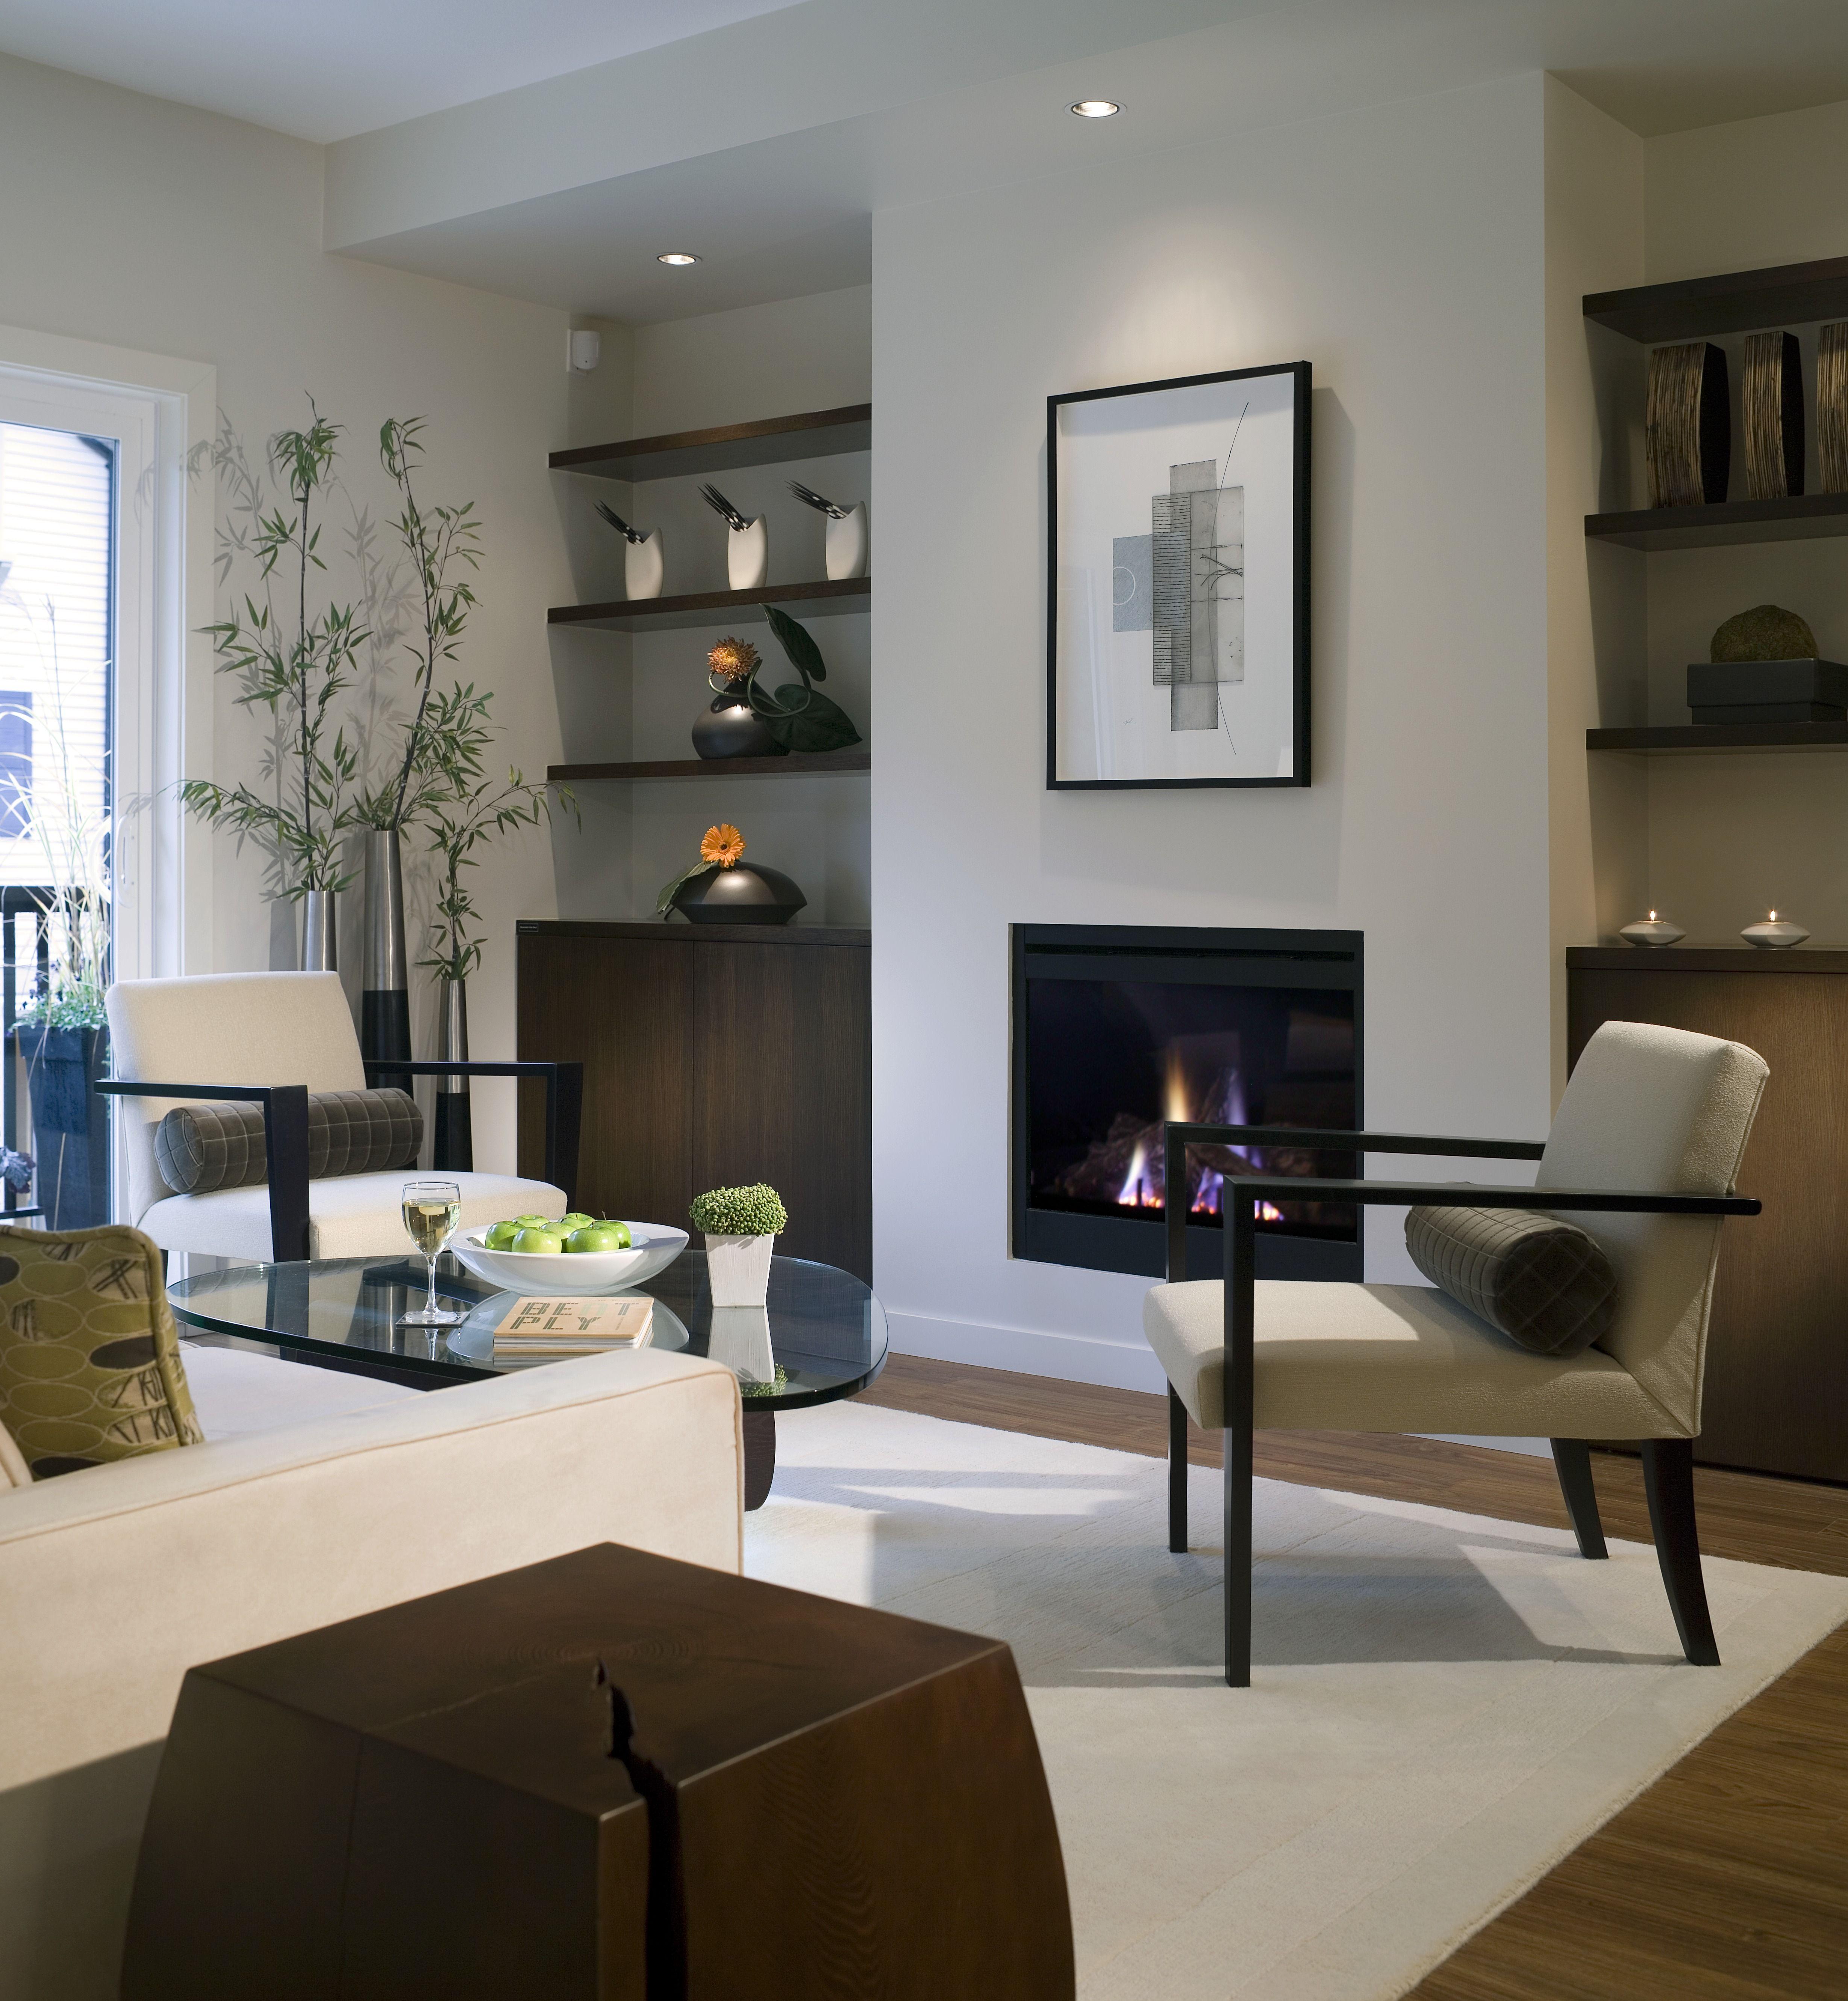 6 Hot Fireplace Design Ideas